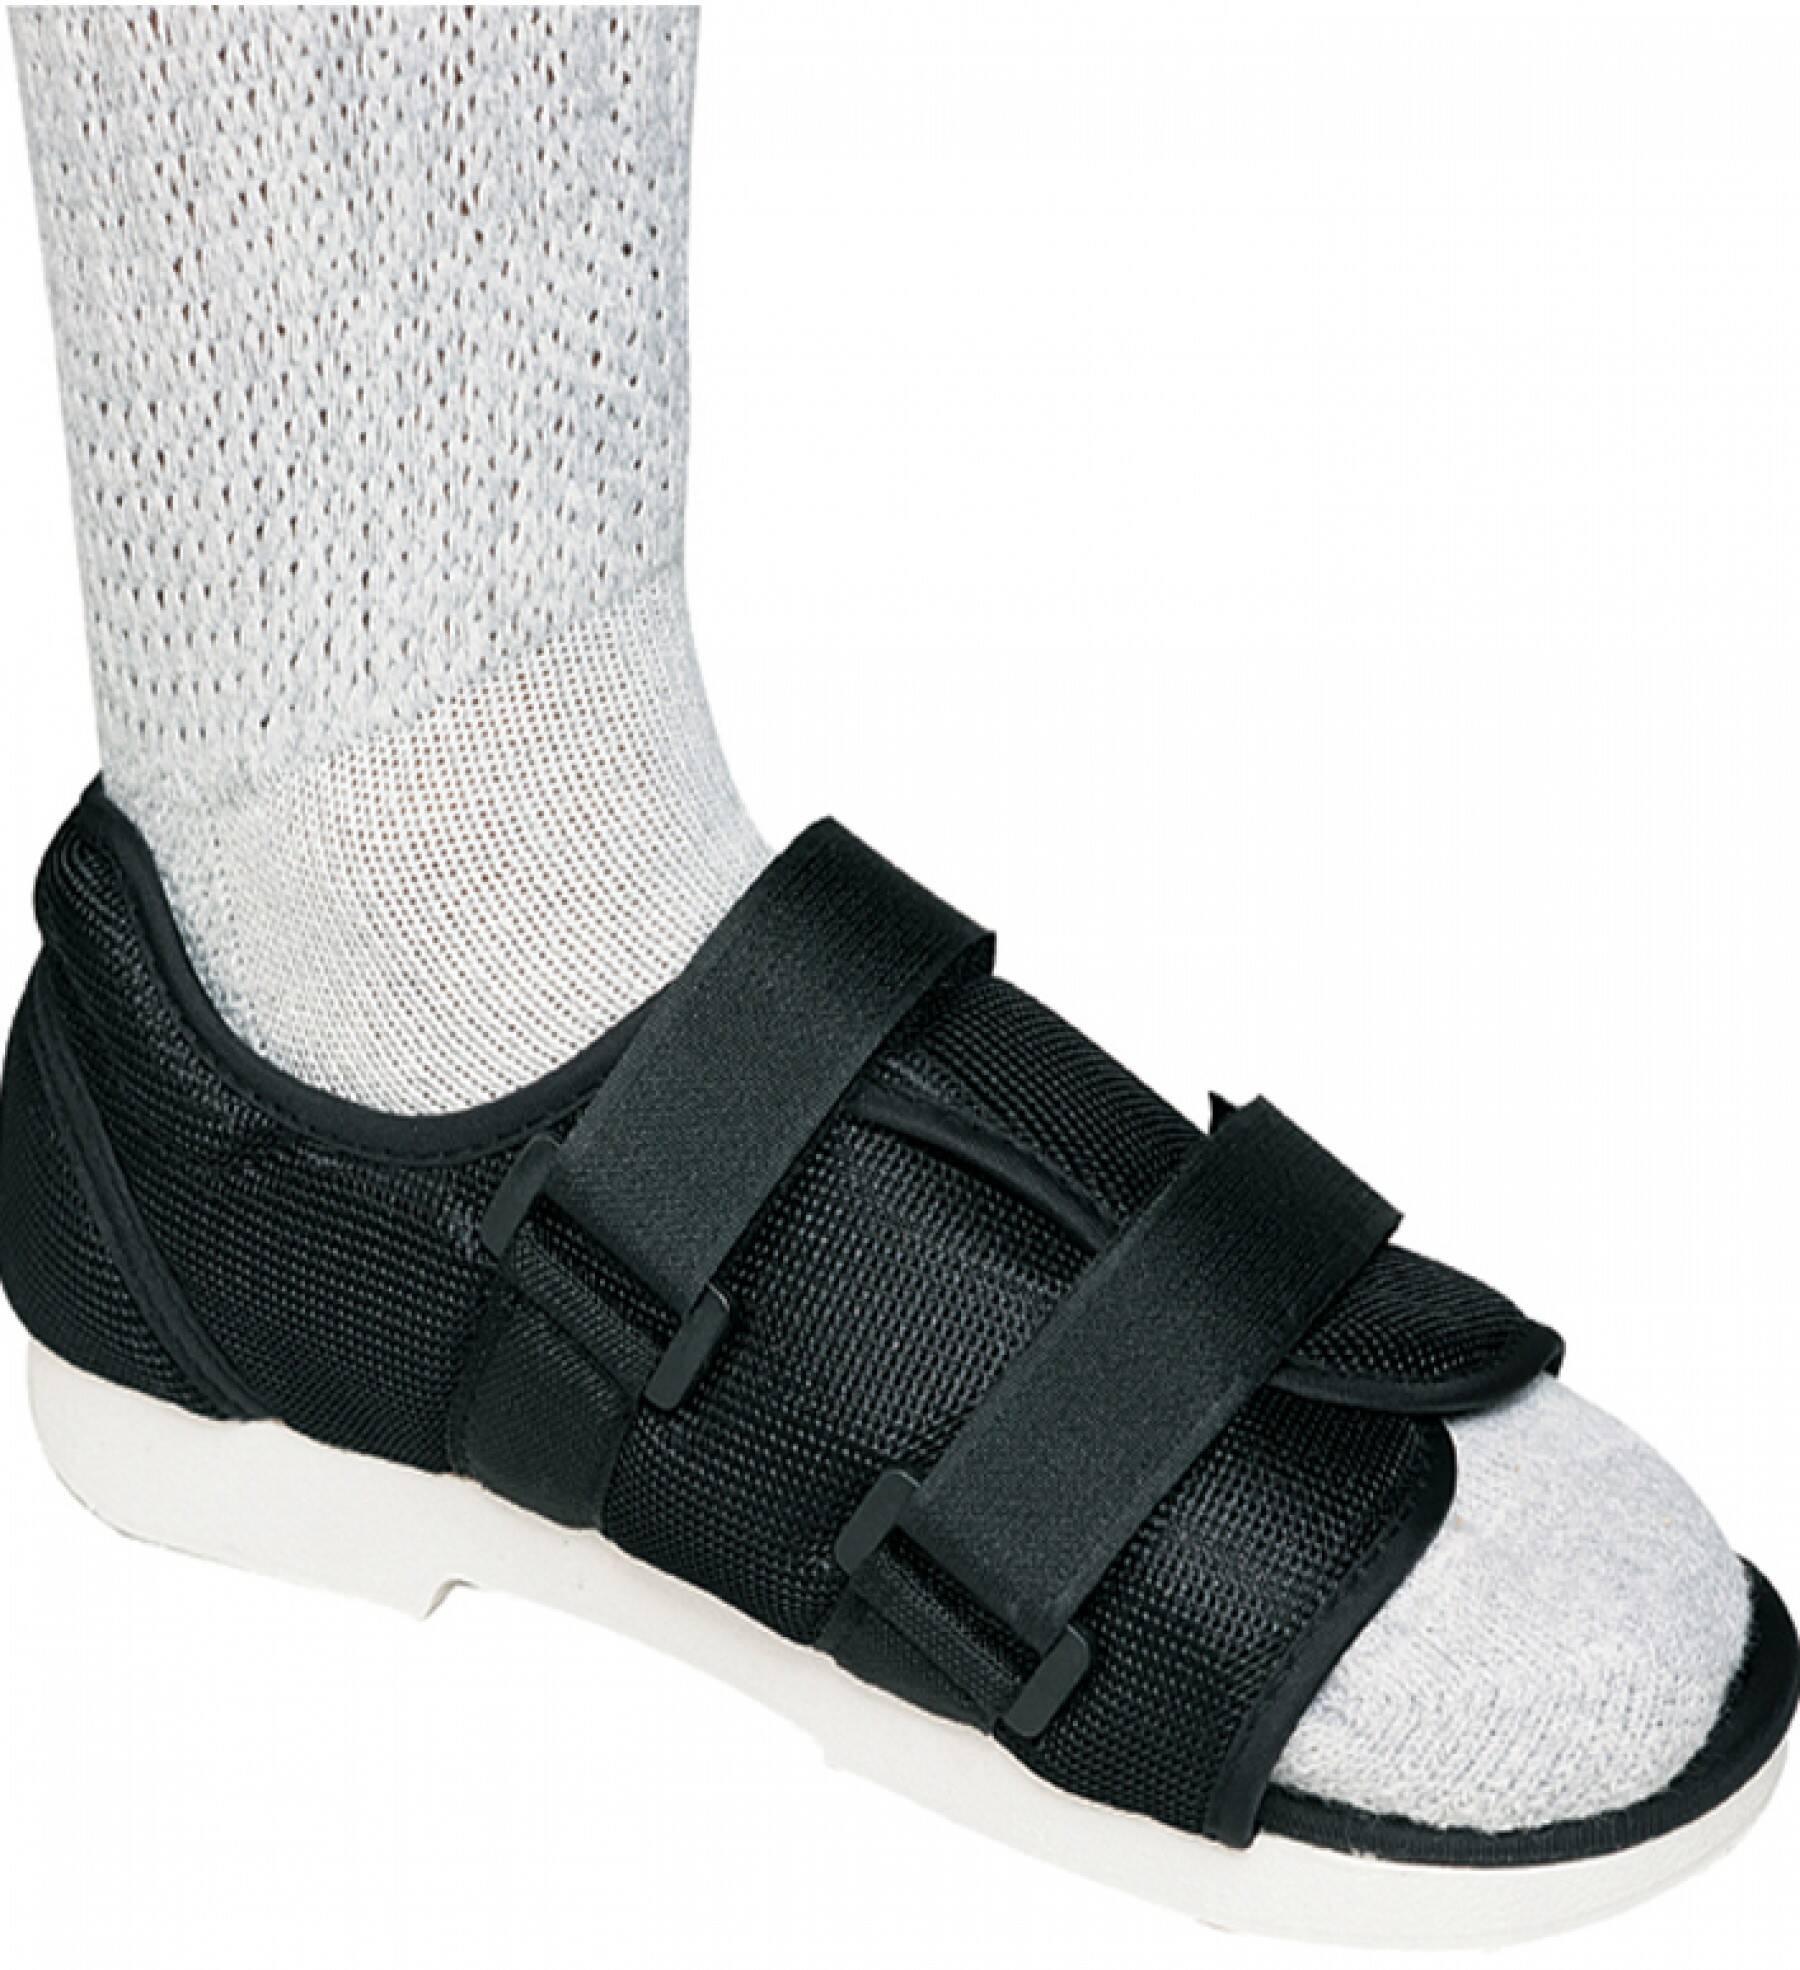 ProCare Medical/Surgical Shoe